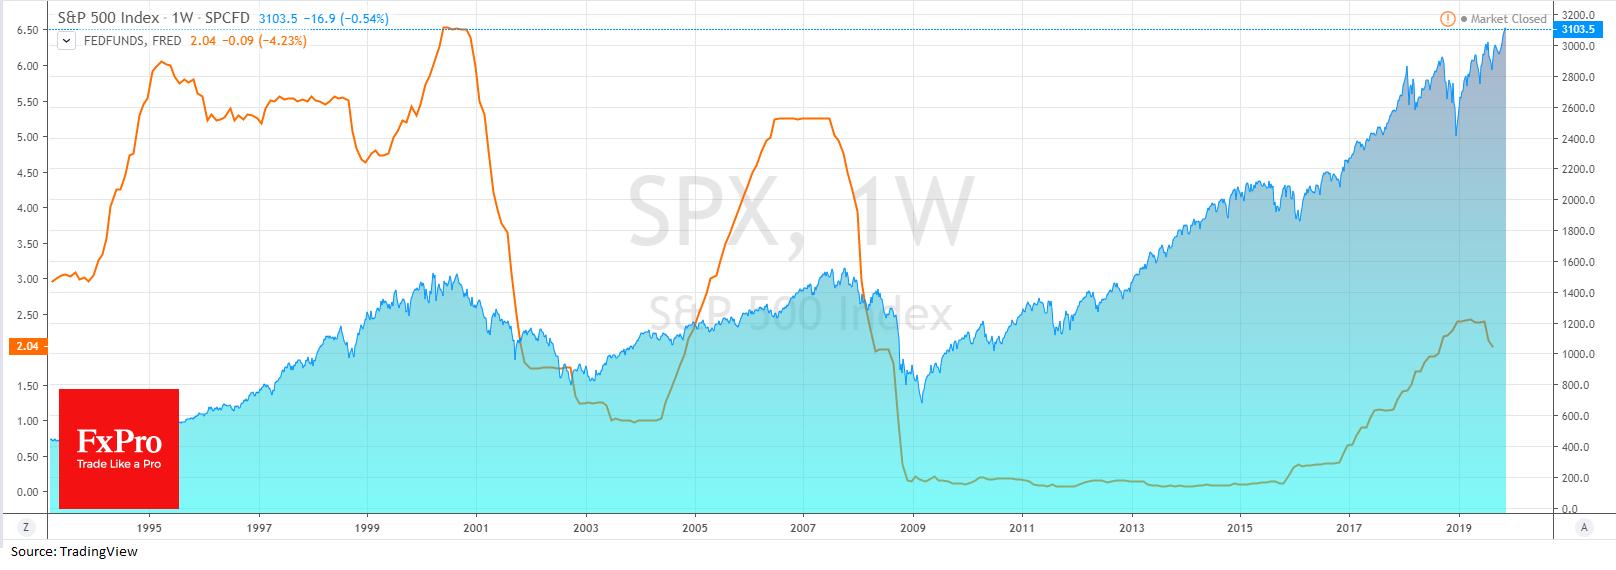 Pump of monetary easing vs Draining markets